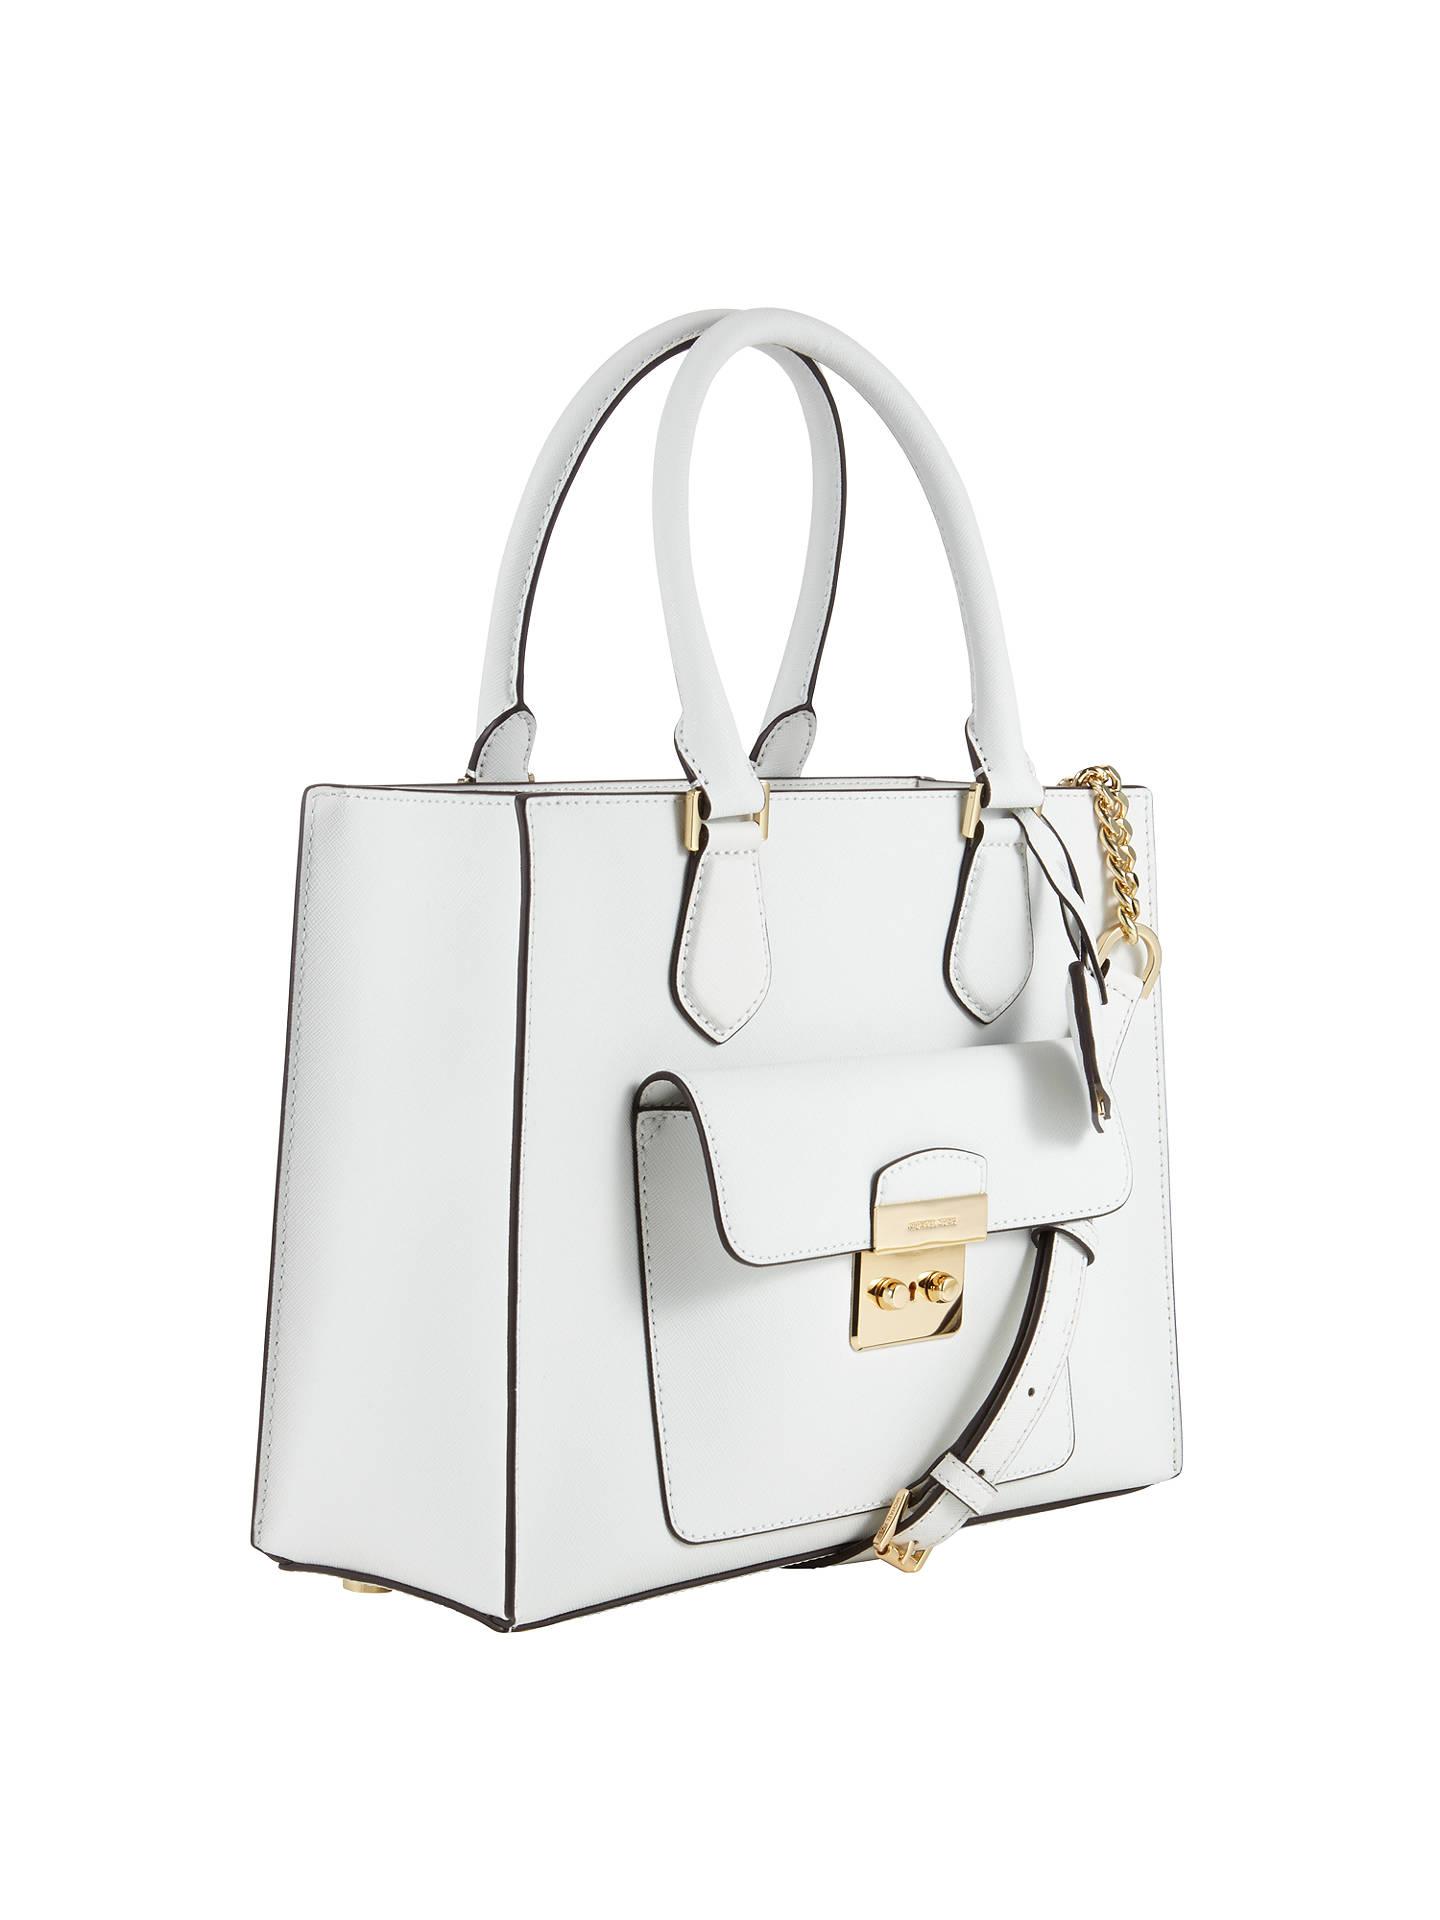 6536159dbdd1 ... Buy MICHAEL Michael Kors Bridgette Medium Tote Bag, Optic White Online  at johnlewis.com